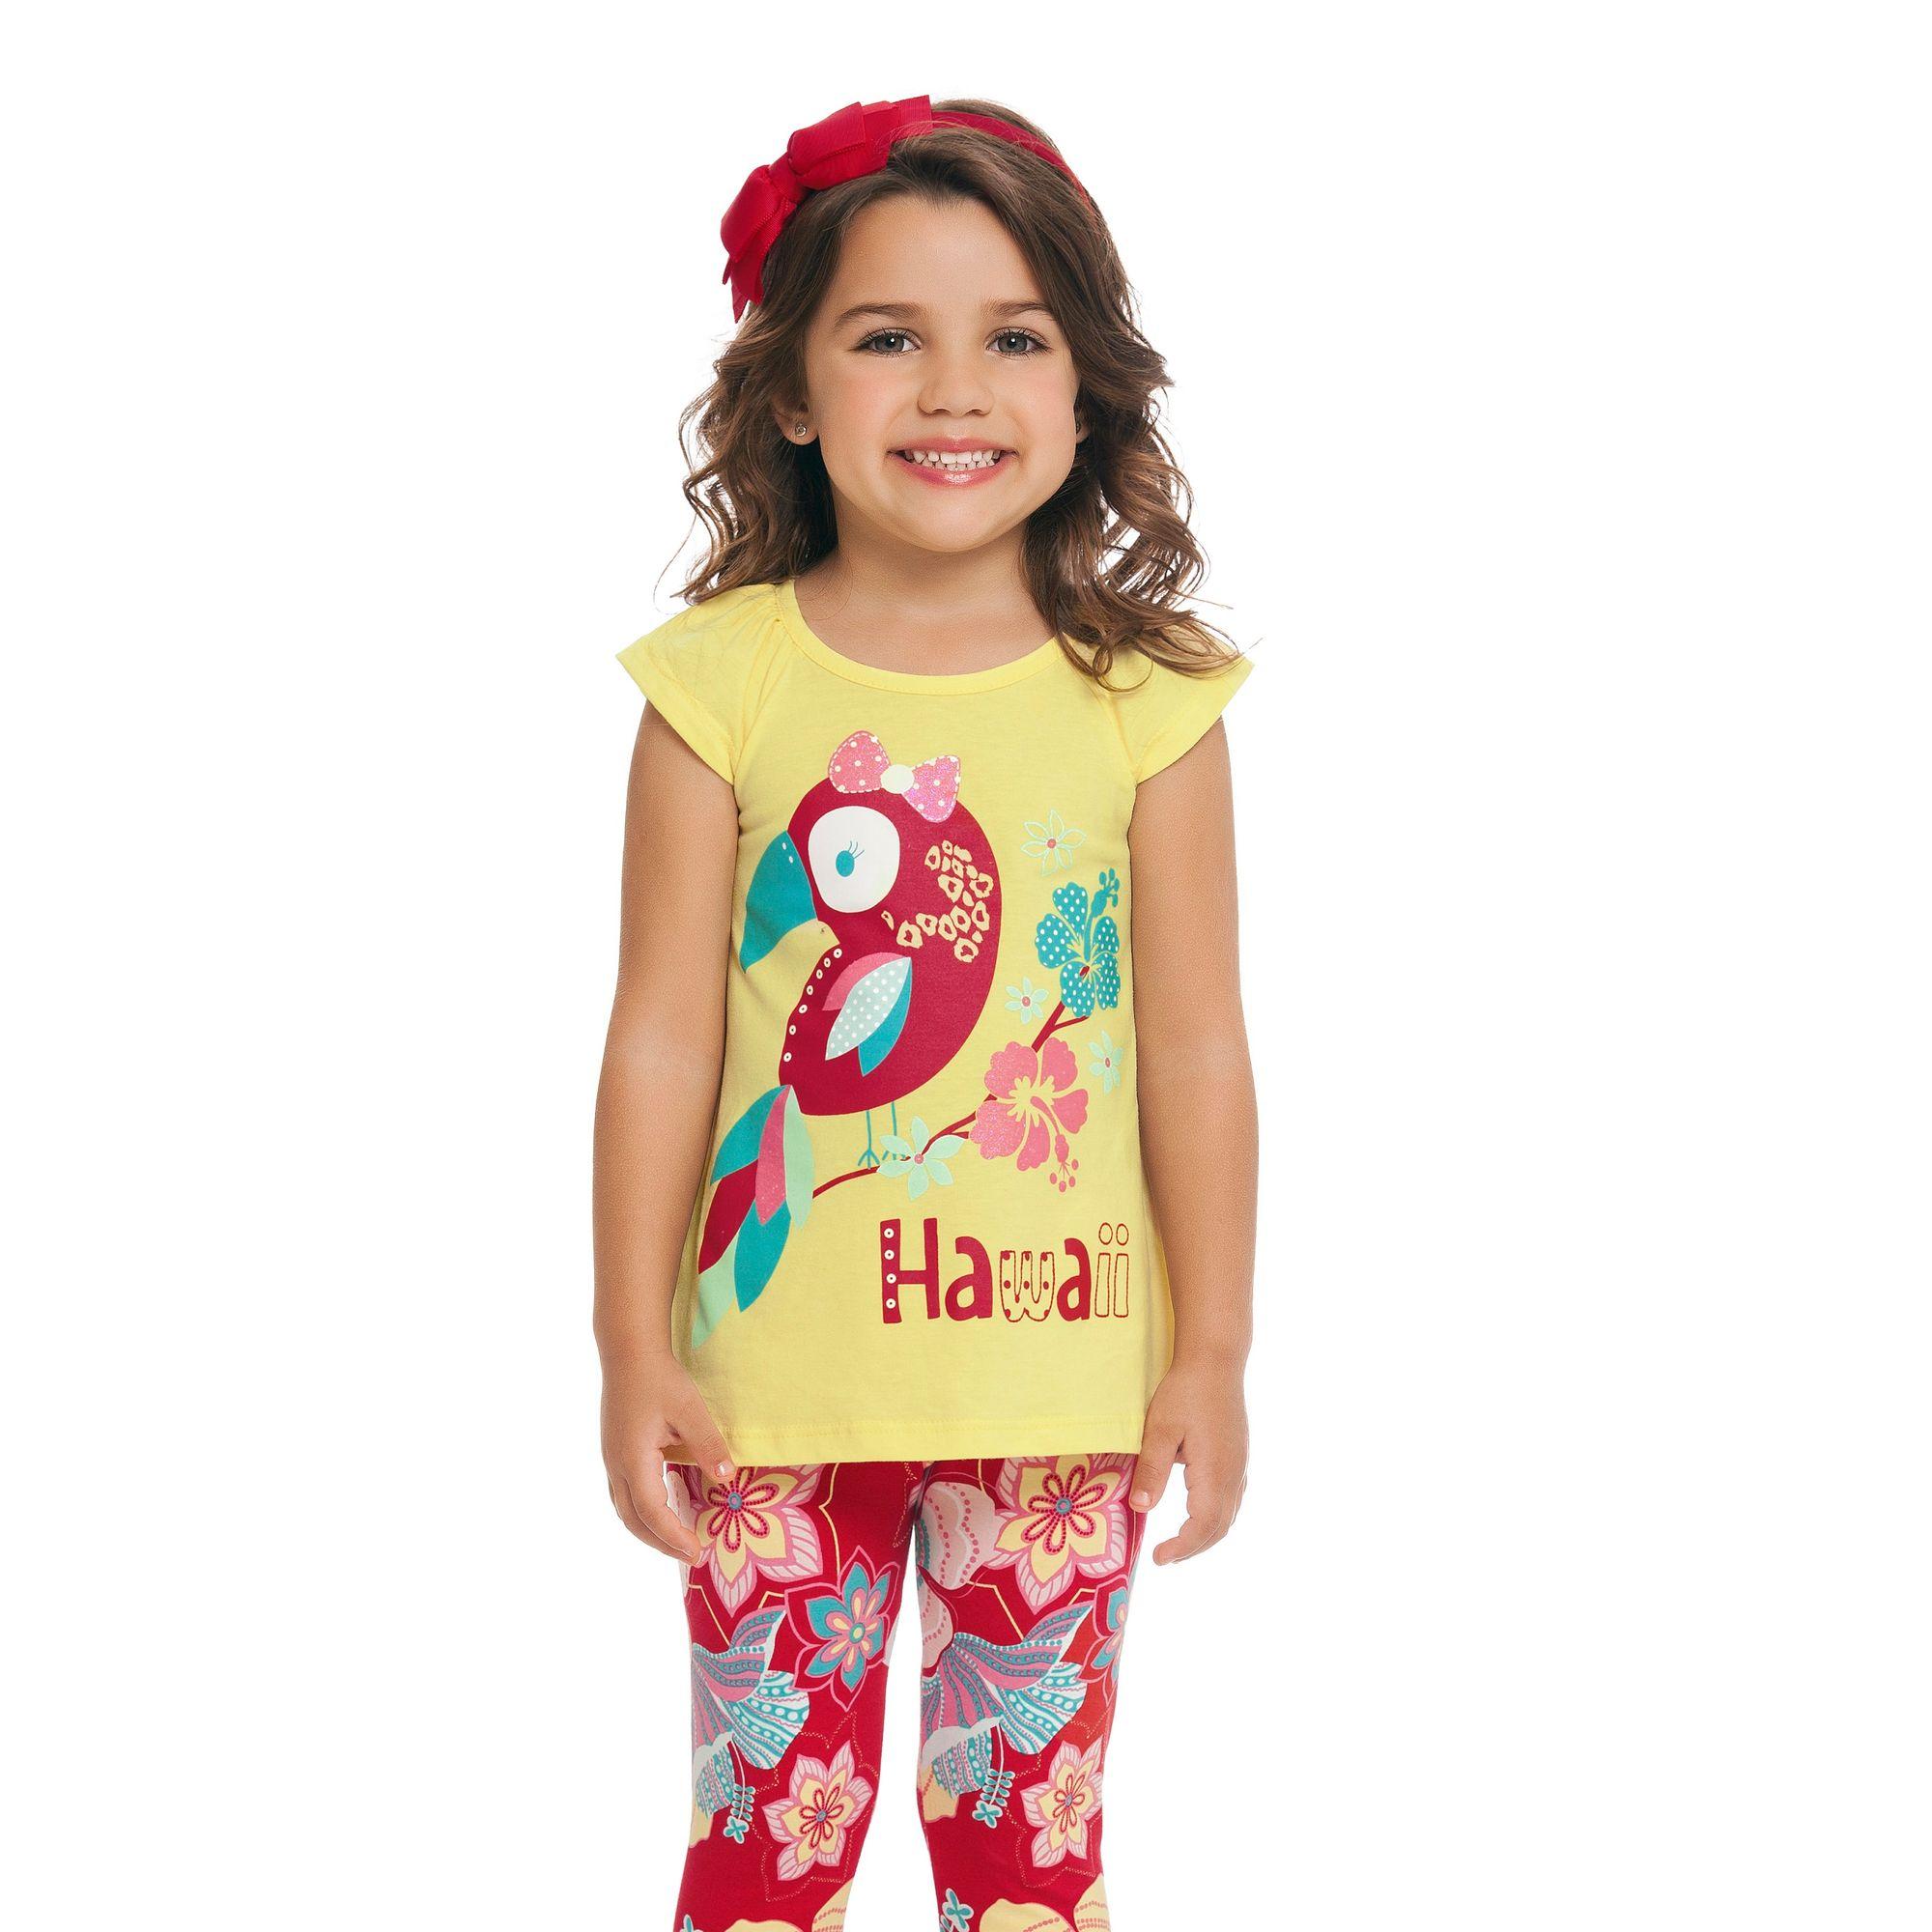 conjunto-menina-camiseta-amarela-hawaii-e-legging-flores-loopy